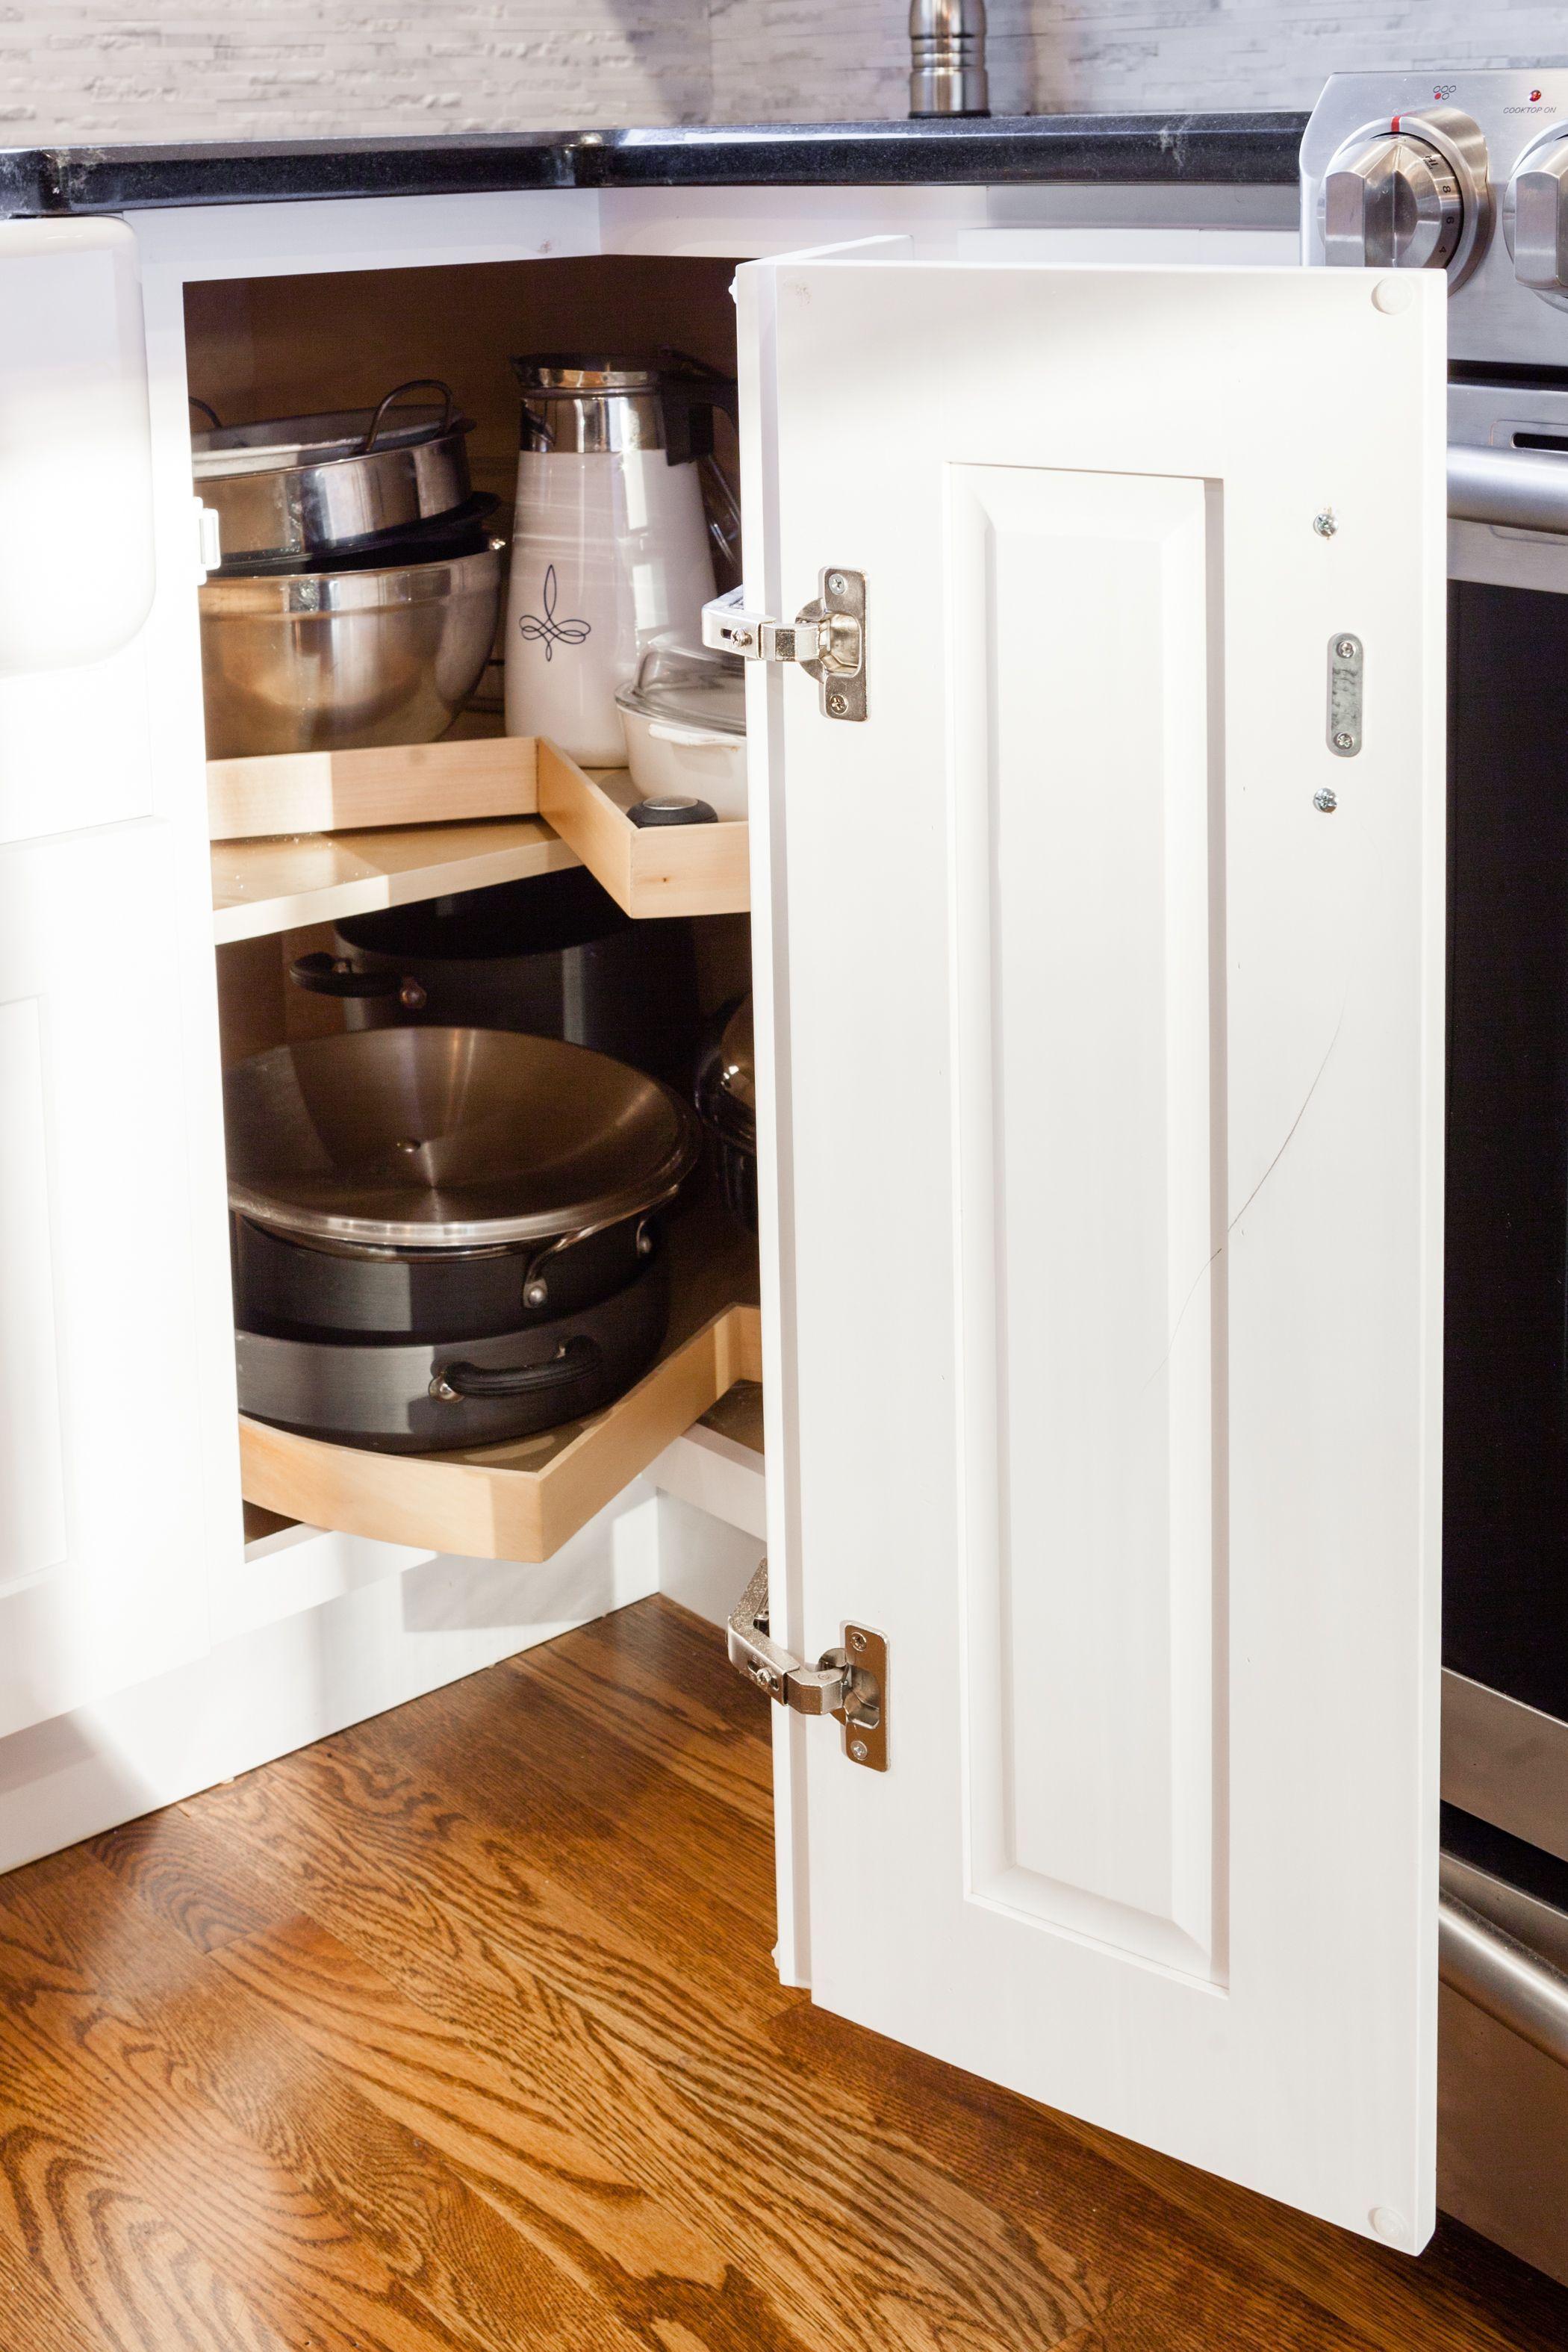 Unfinished Kitchen Cabinets San Antonio 2020 Unfinished Kitchen Cabinets White Shaker Kitchen Cabinets Shaker Kitchen Cabinets